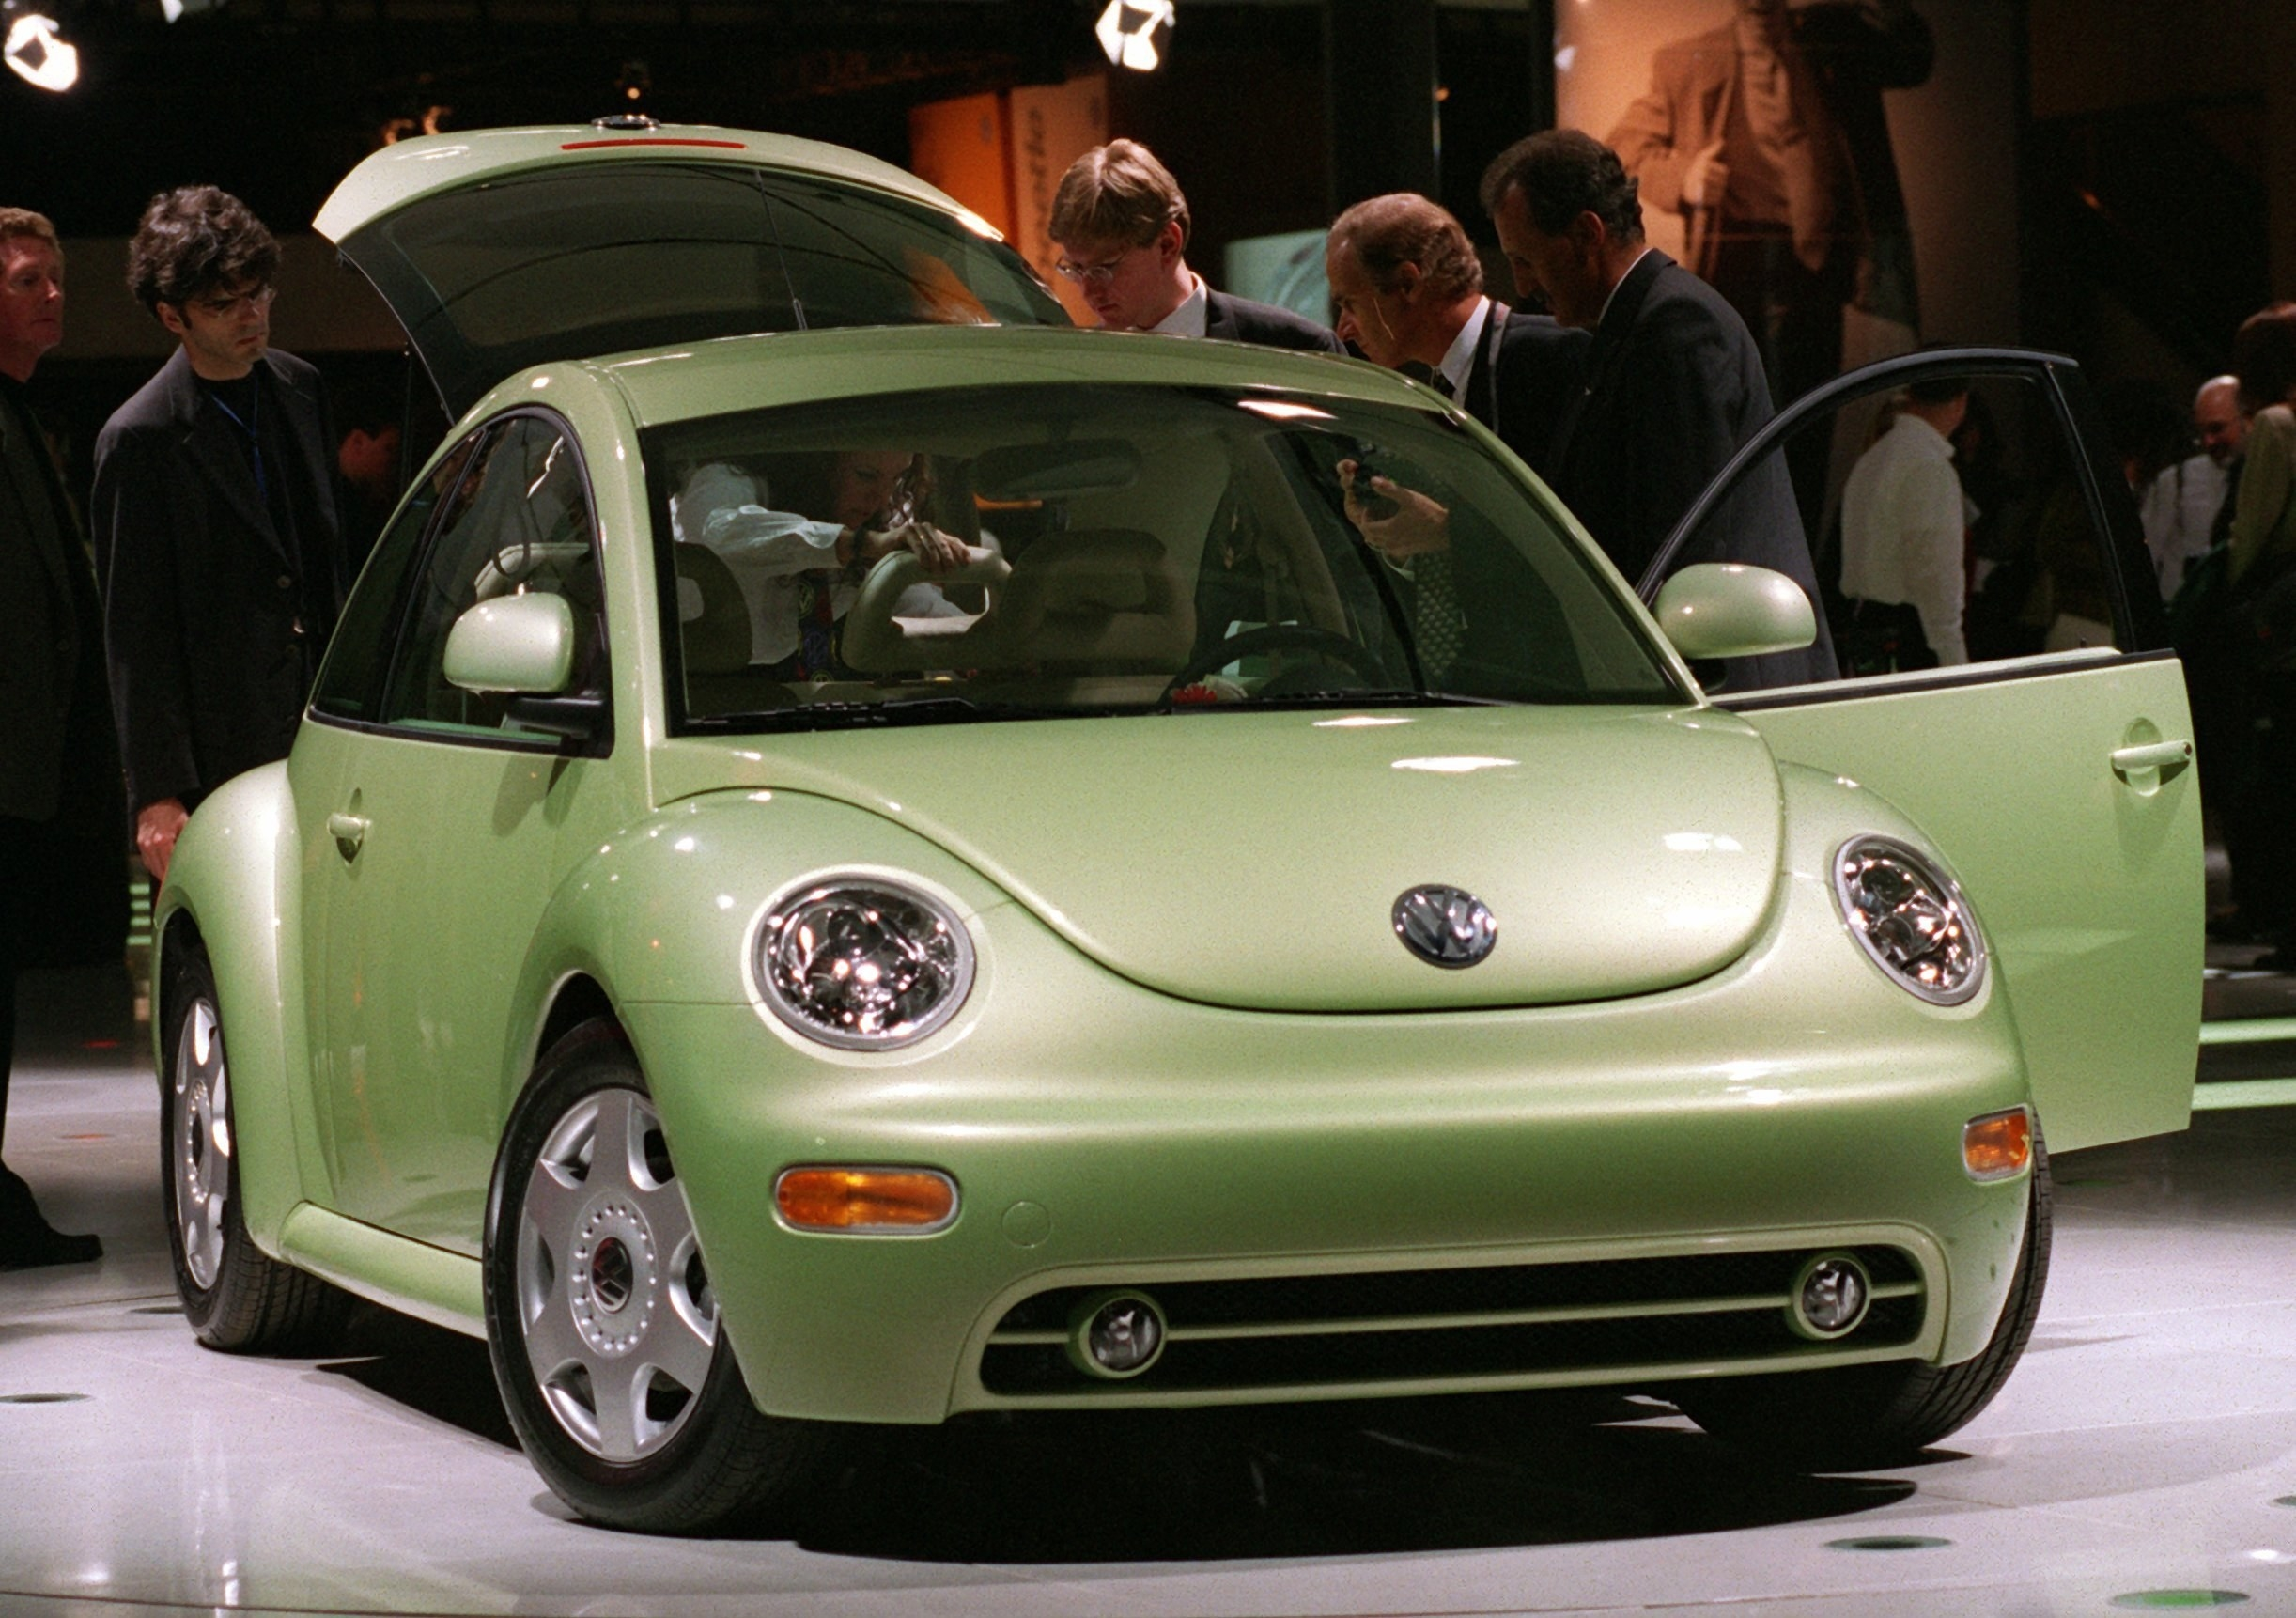 A lime green VW Beetle on display